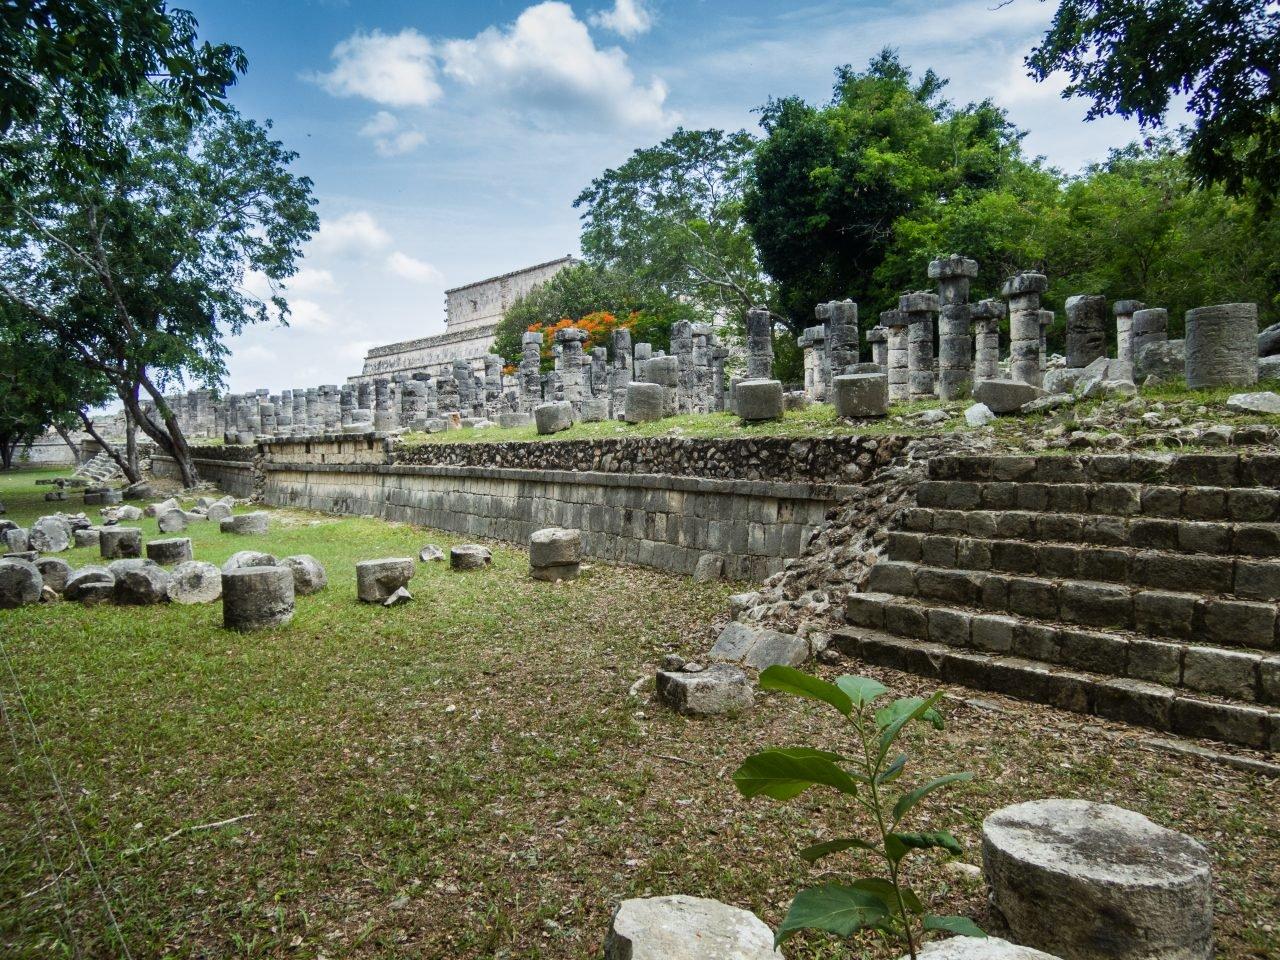 SRE solicitó a la Unesco que supervise la construcción del Tren Maya